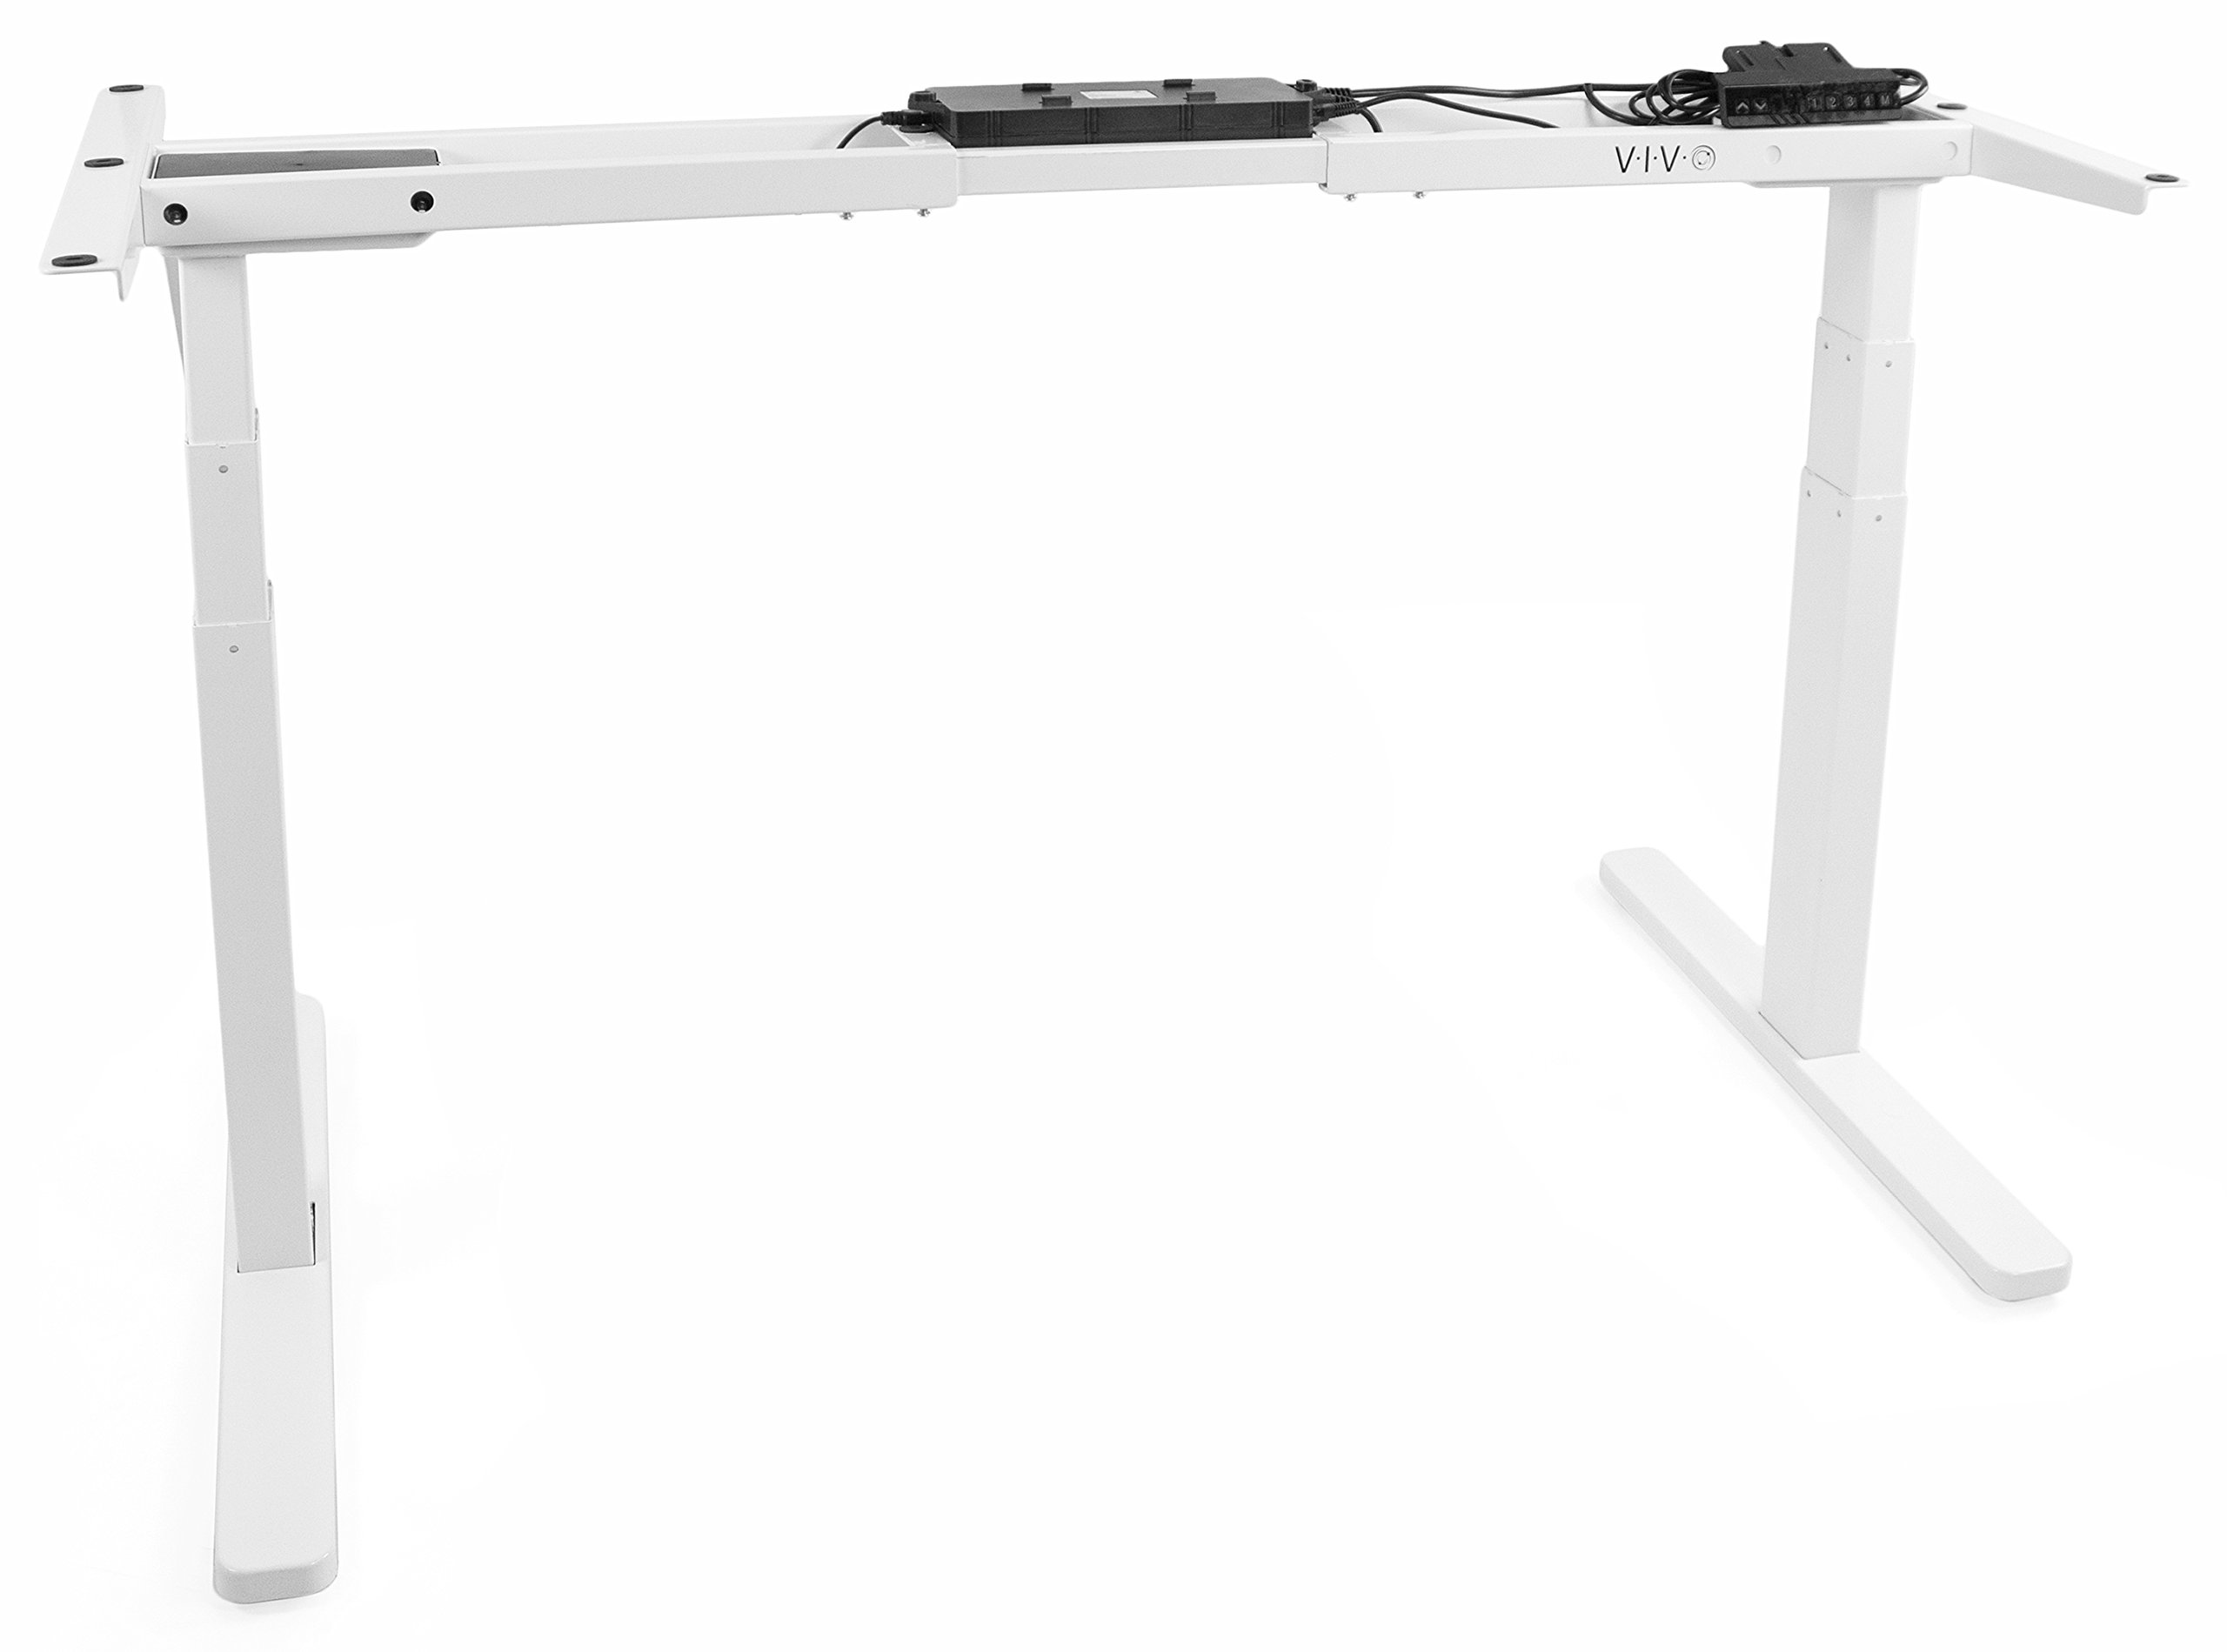 VIVO White Electric Dual Motor Stand Up Desk Frame | Standing Height Adjustable Workstation Base (Desk Frame Only) Ergonomic Desk Legs (DESK-V120EW)